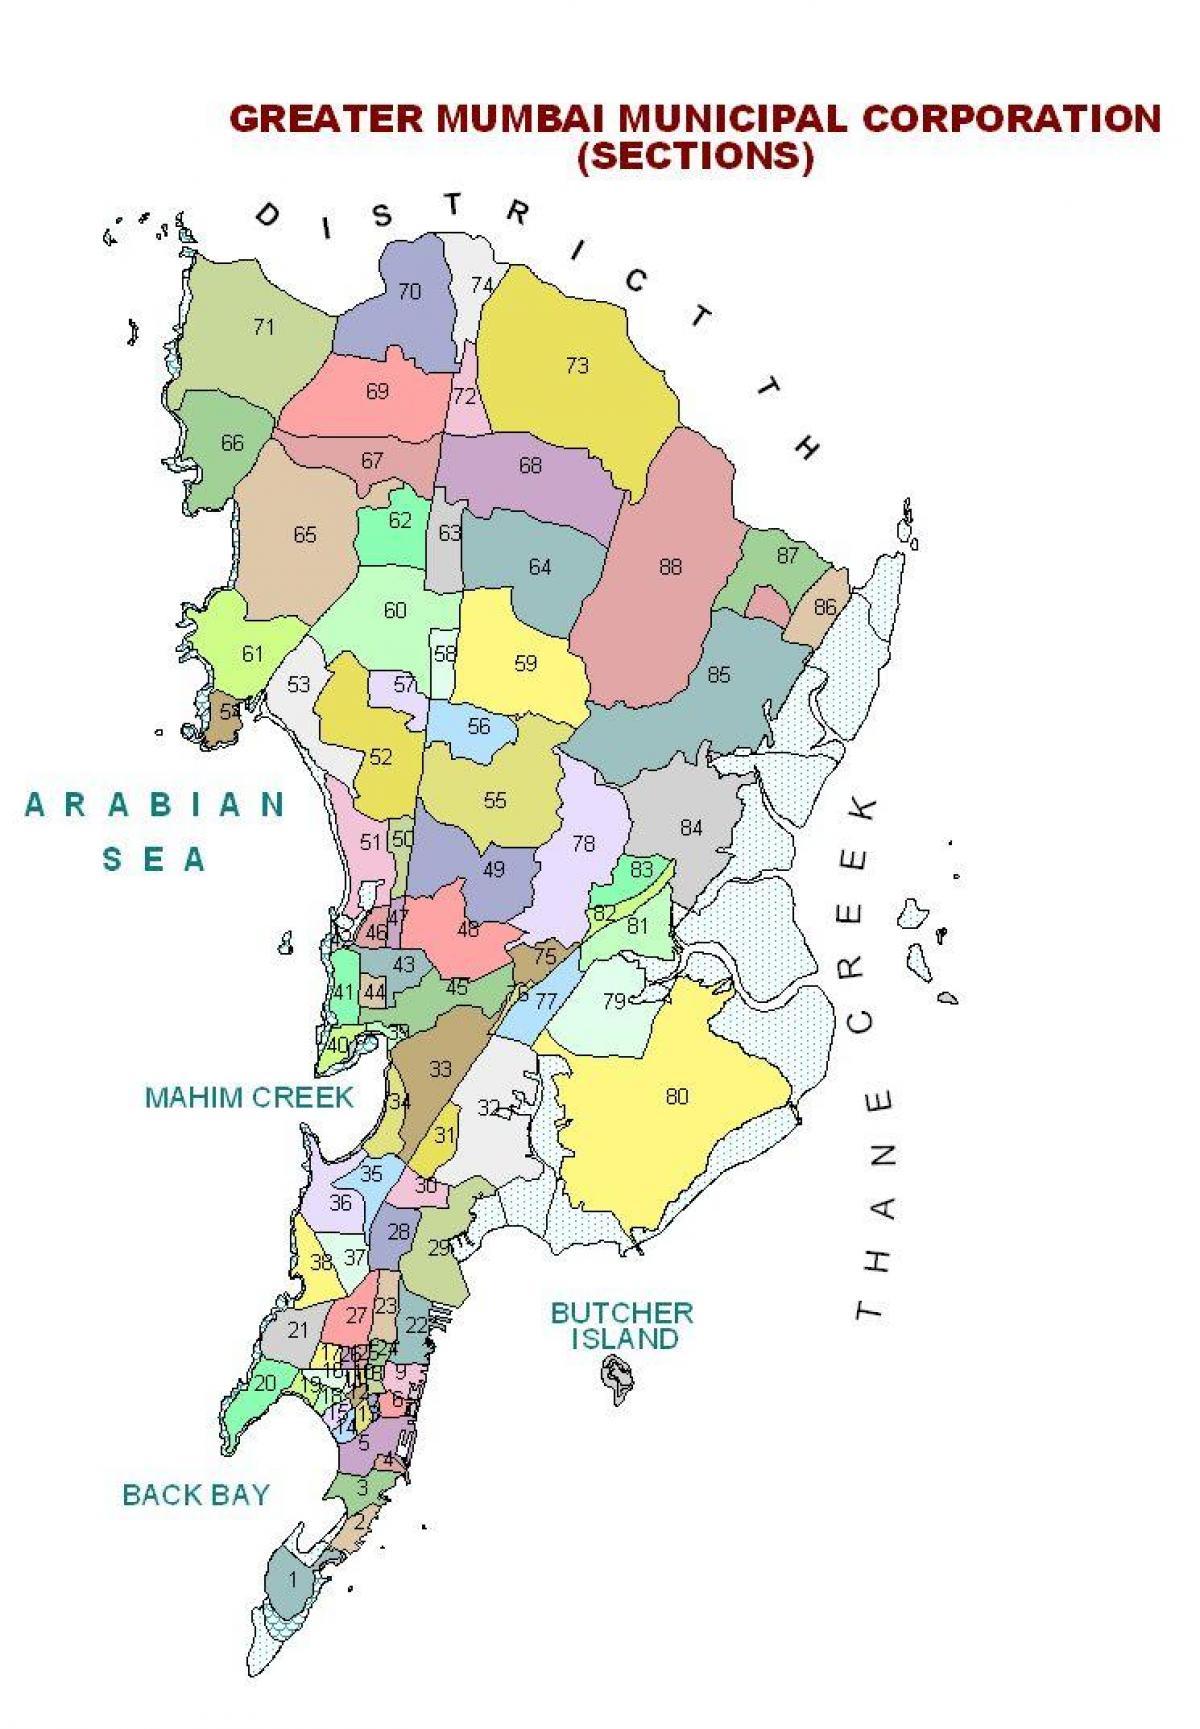 India Politica Cartina.Mumbai Mappa Politica Cartina Politica Di Mumbai Maharashtra India